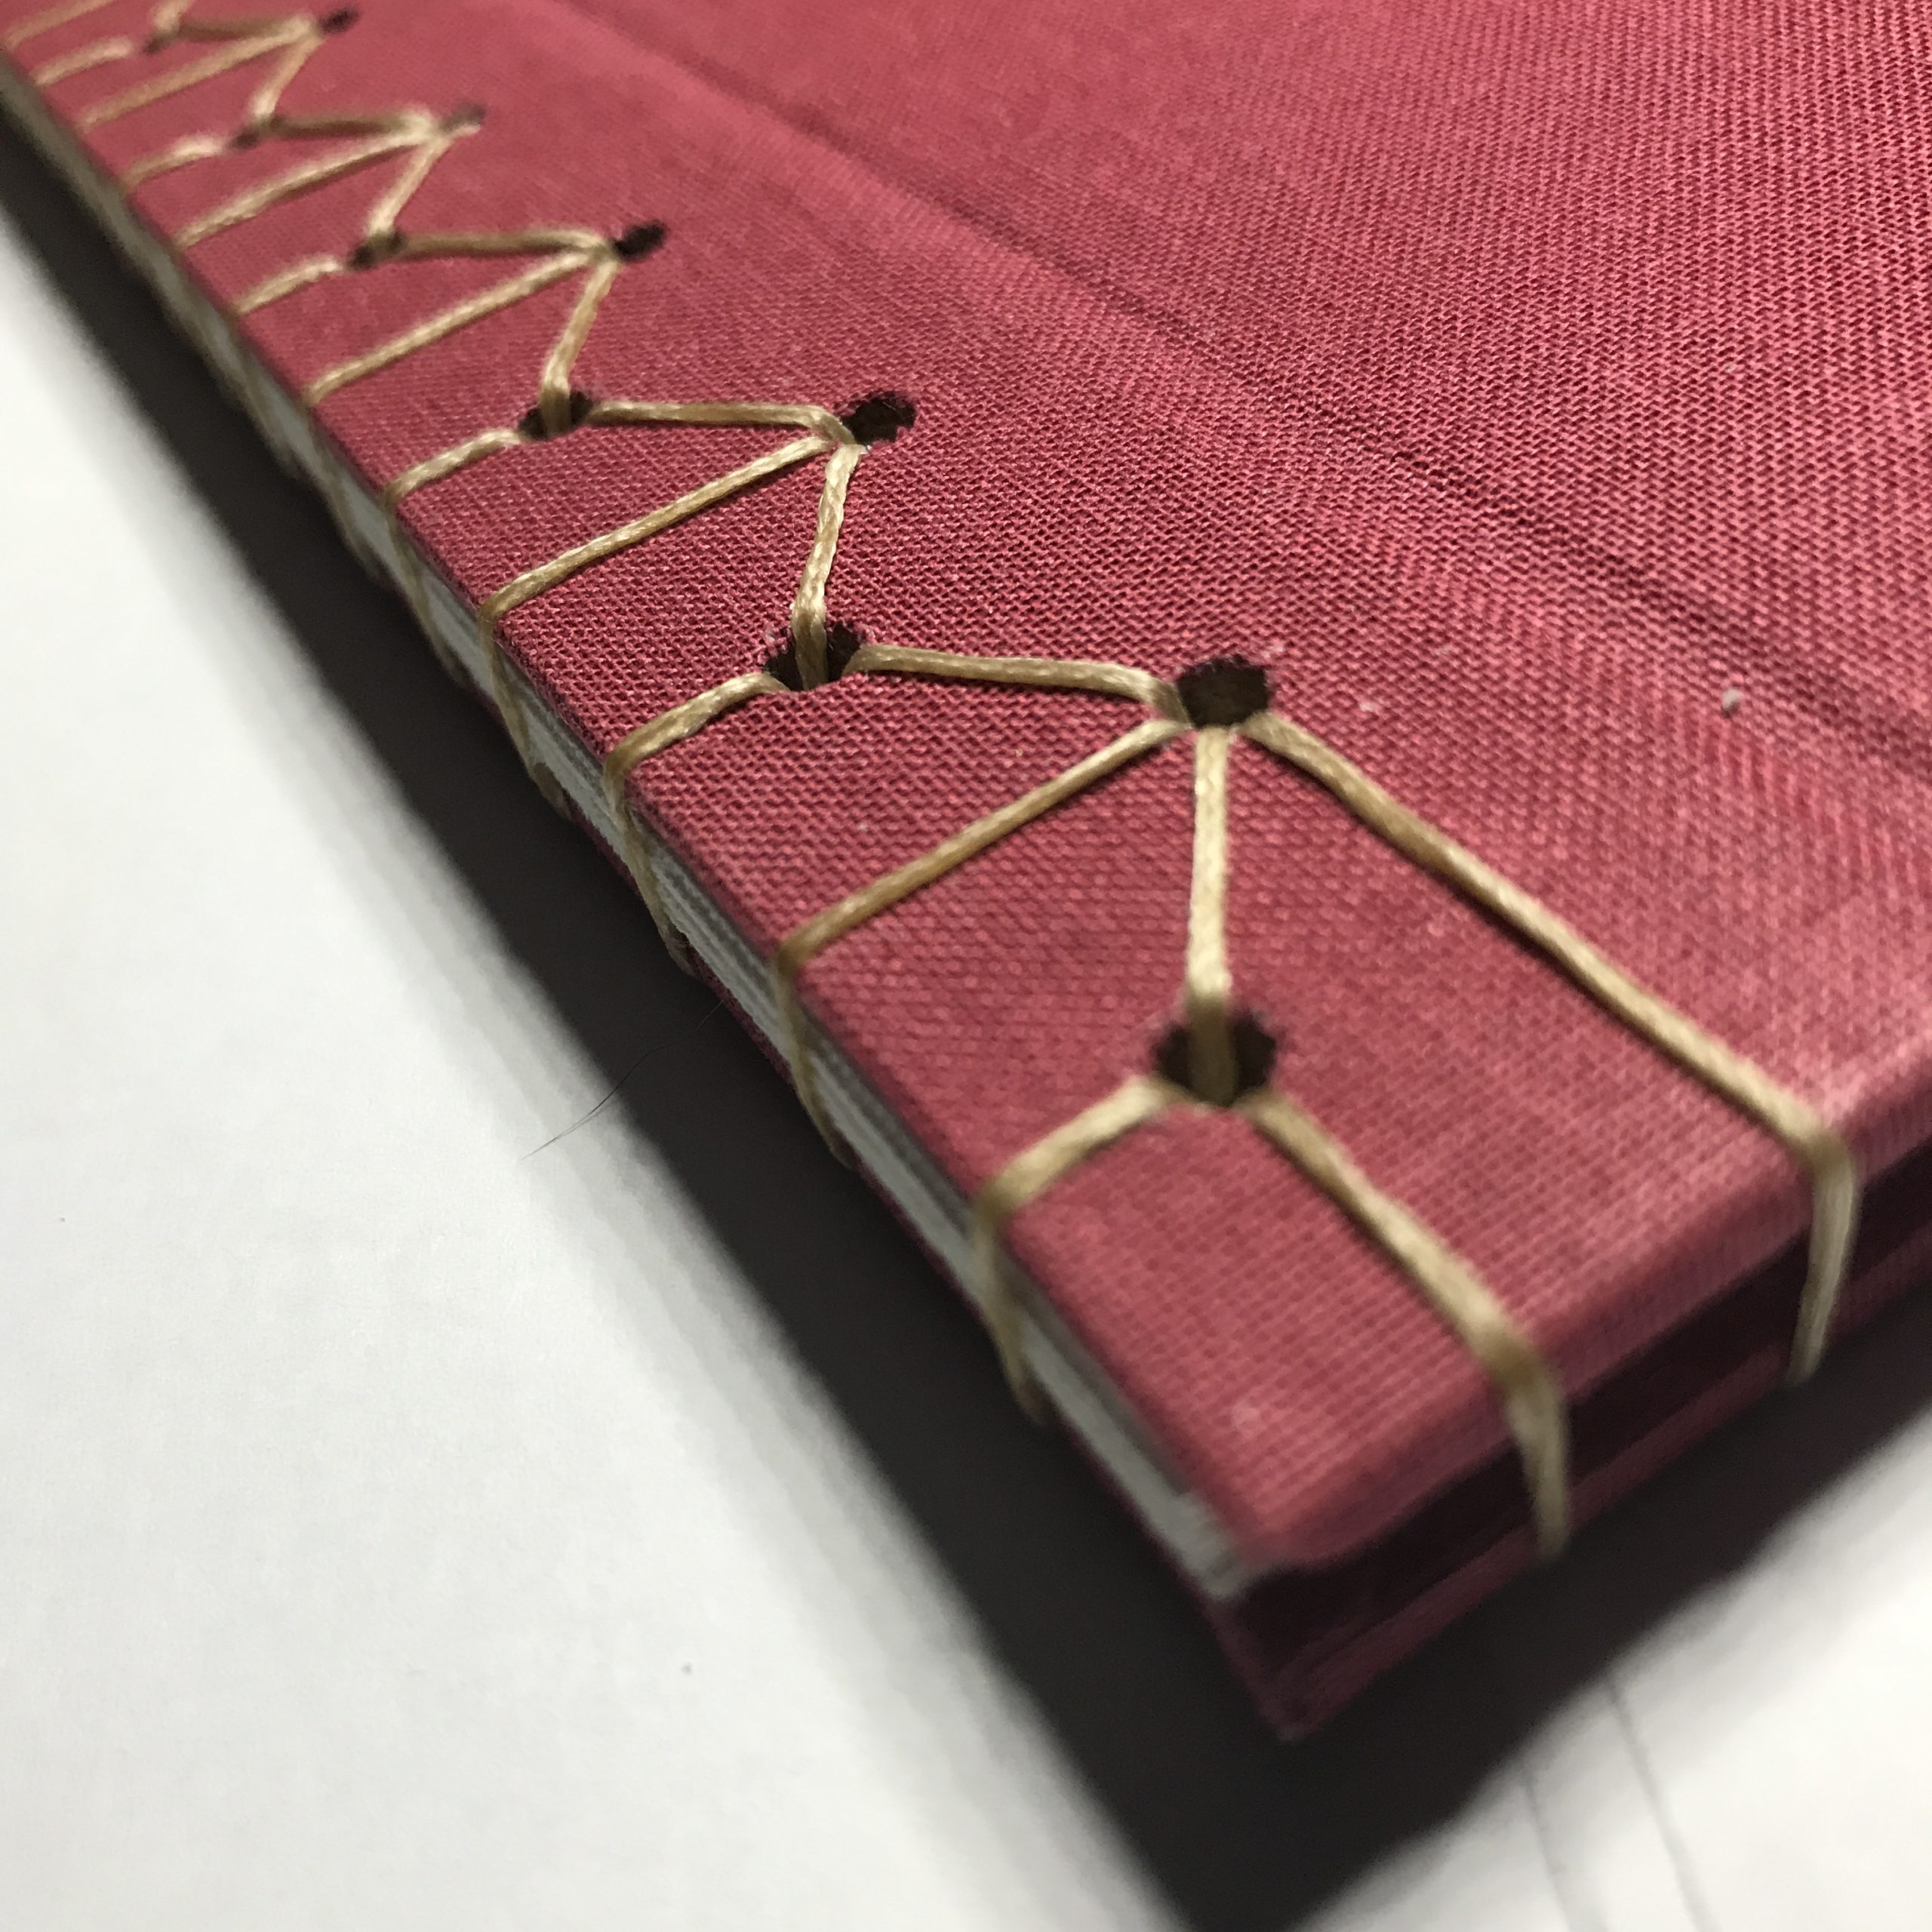 Closeup of stab stitching